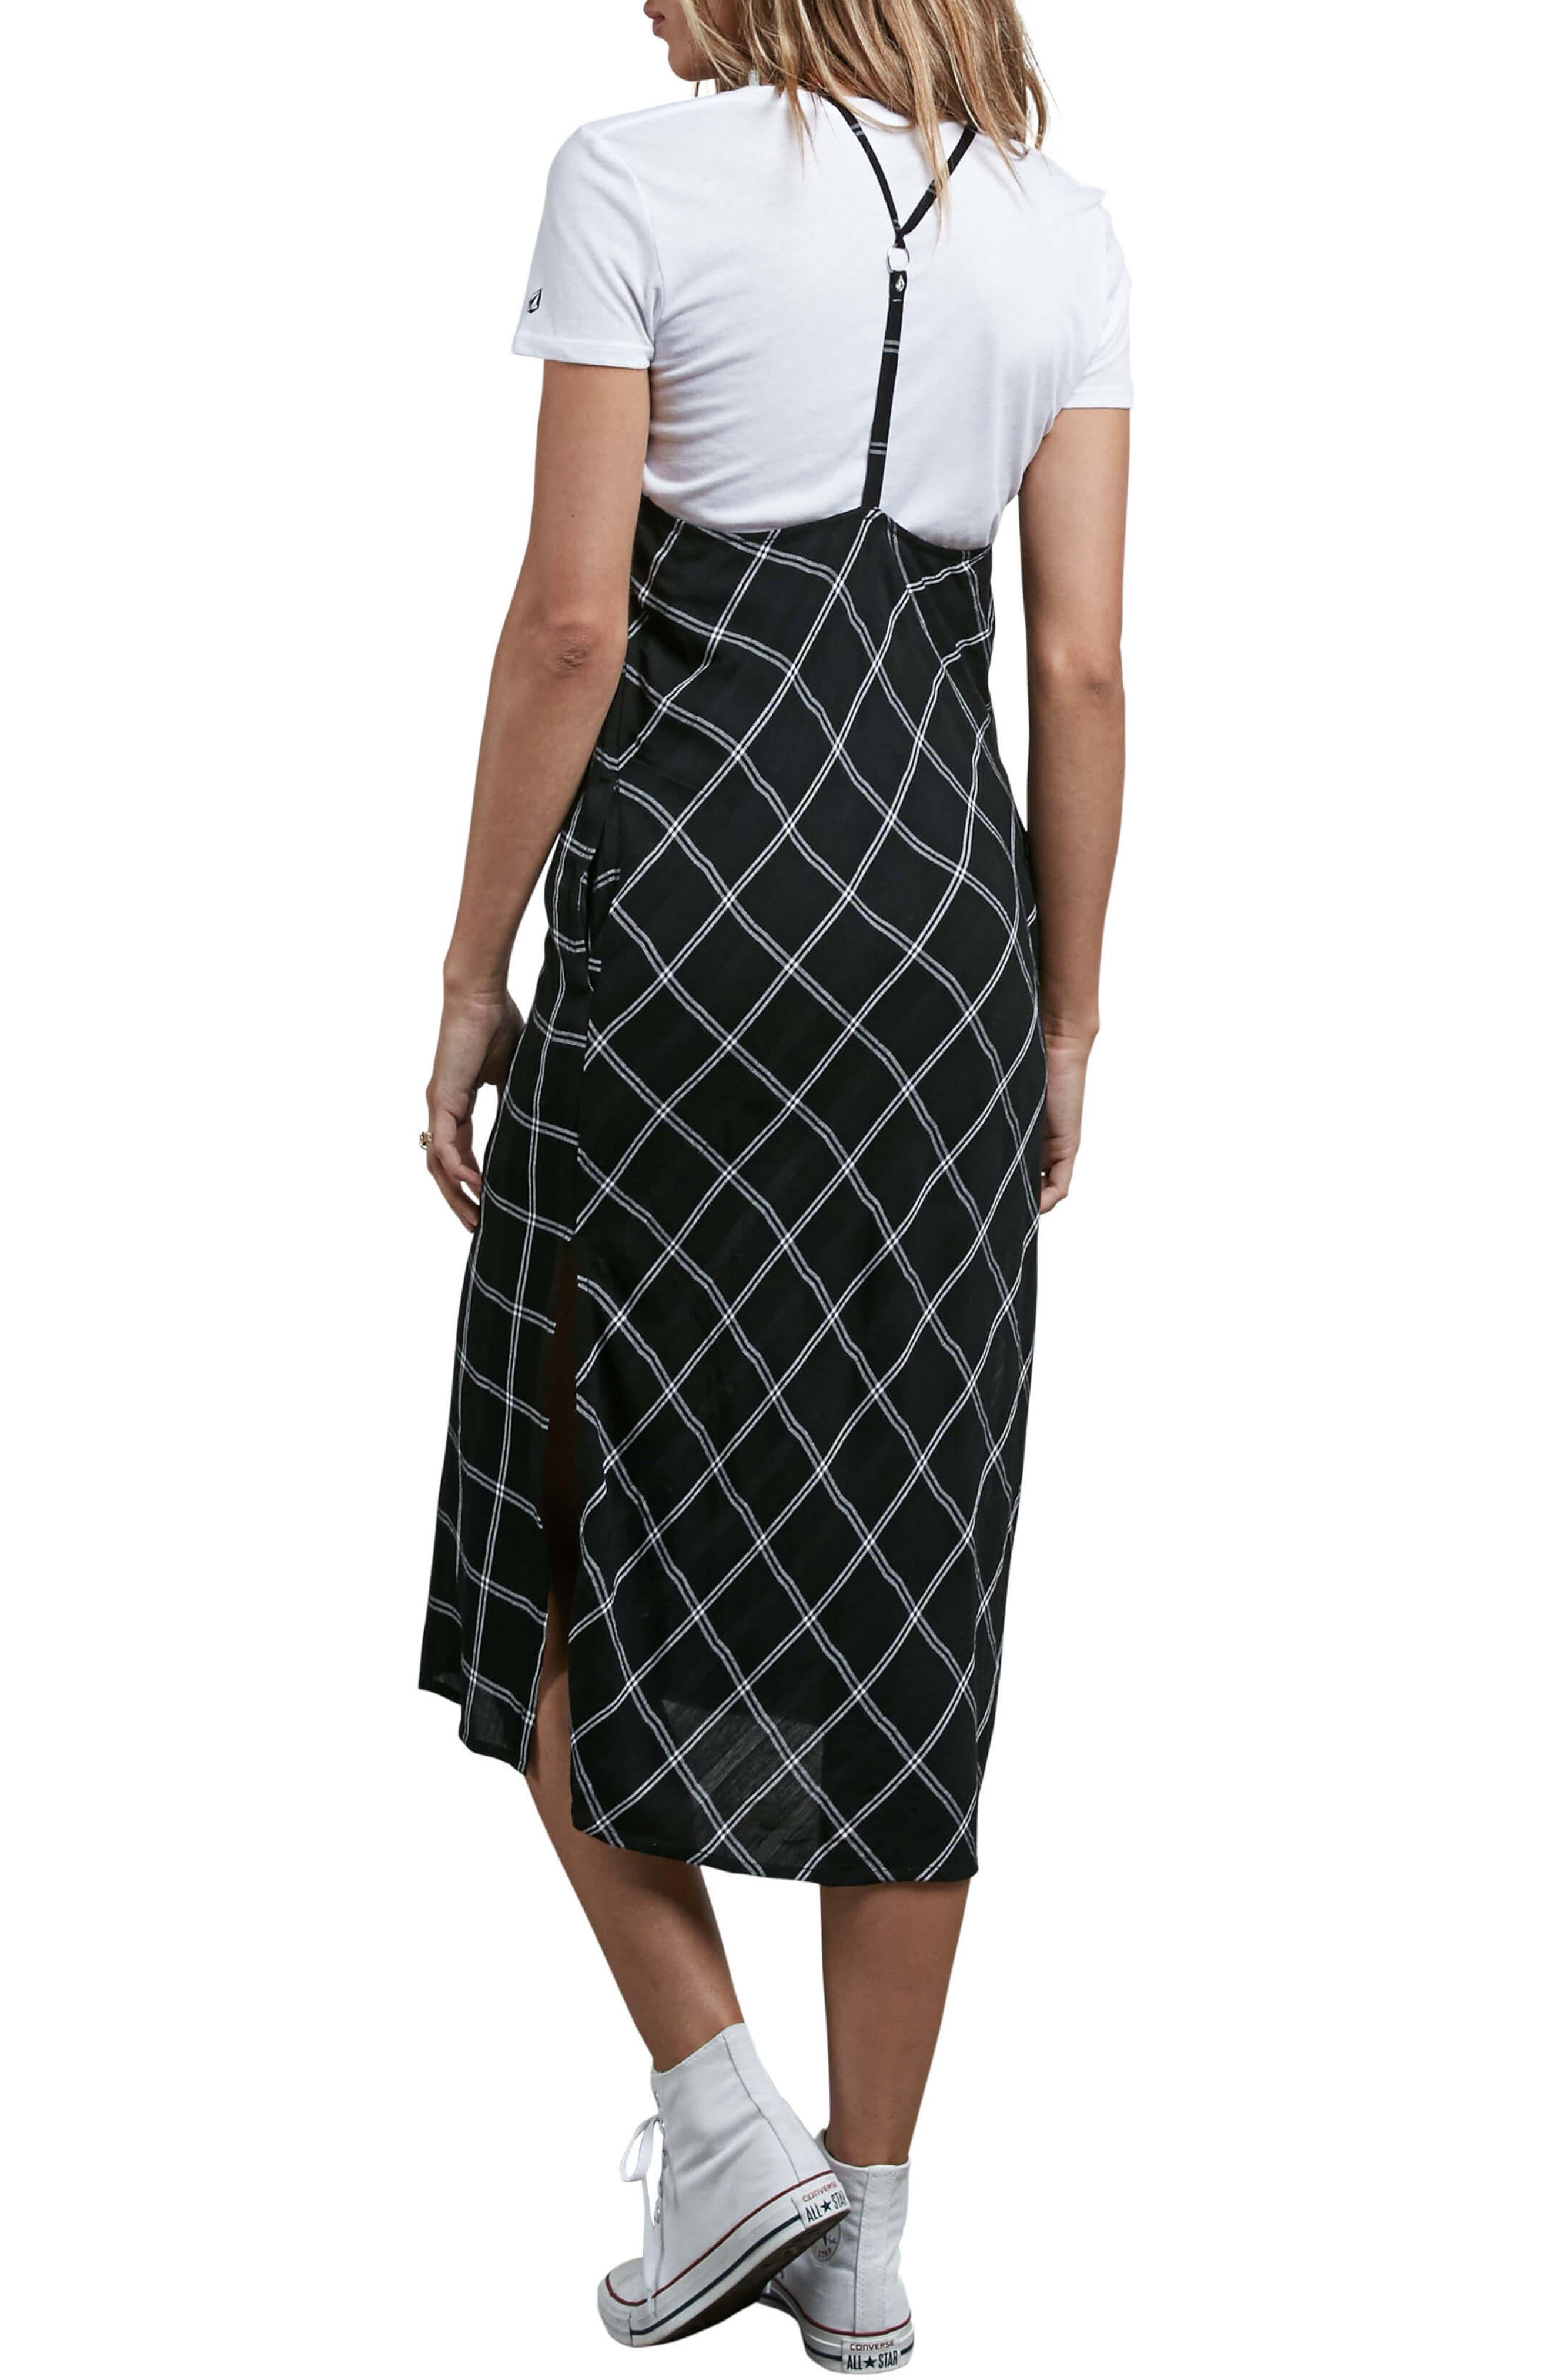 Jumponit Windowpane Print Midi Dress,                             Alternate thumbnail 2, color,                             Black